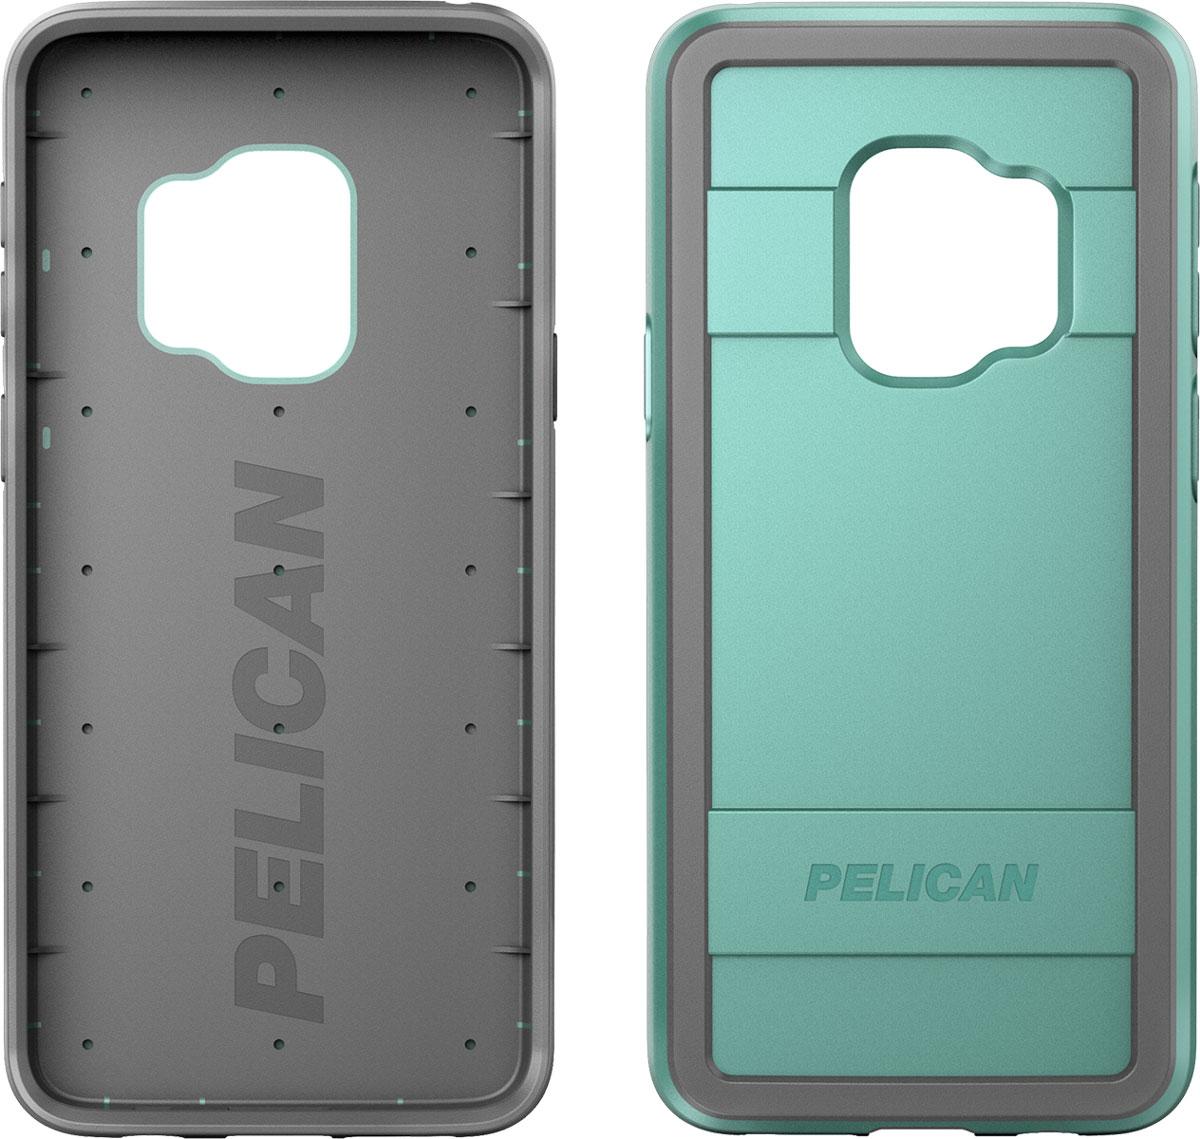 pelican samsung s9 protector phone case